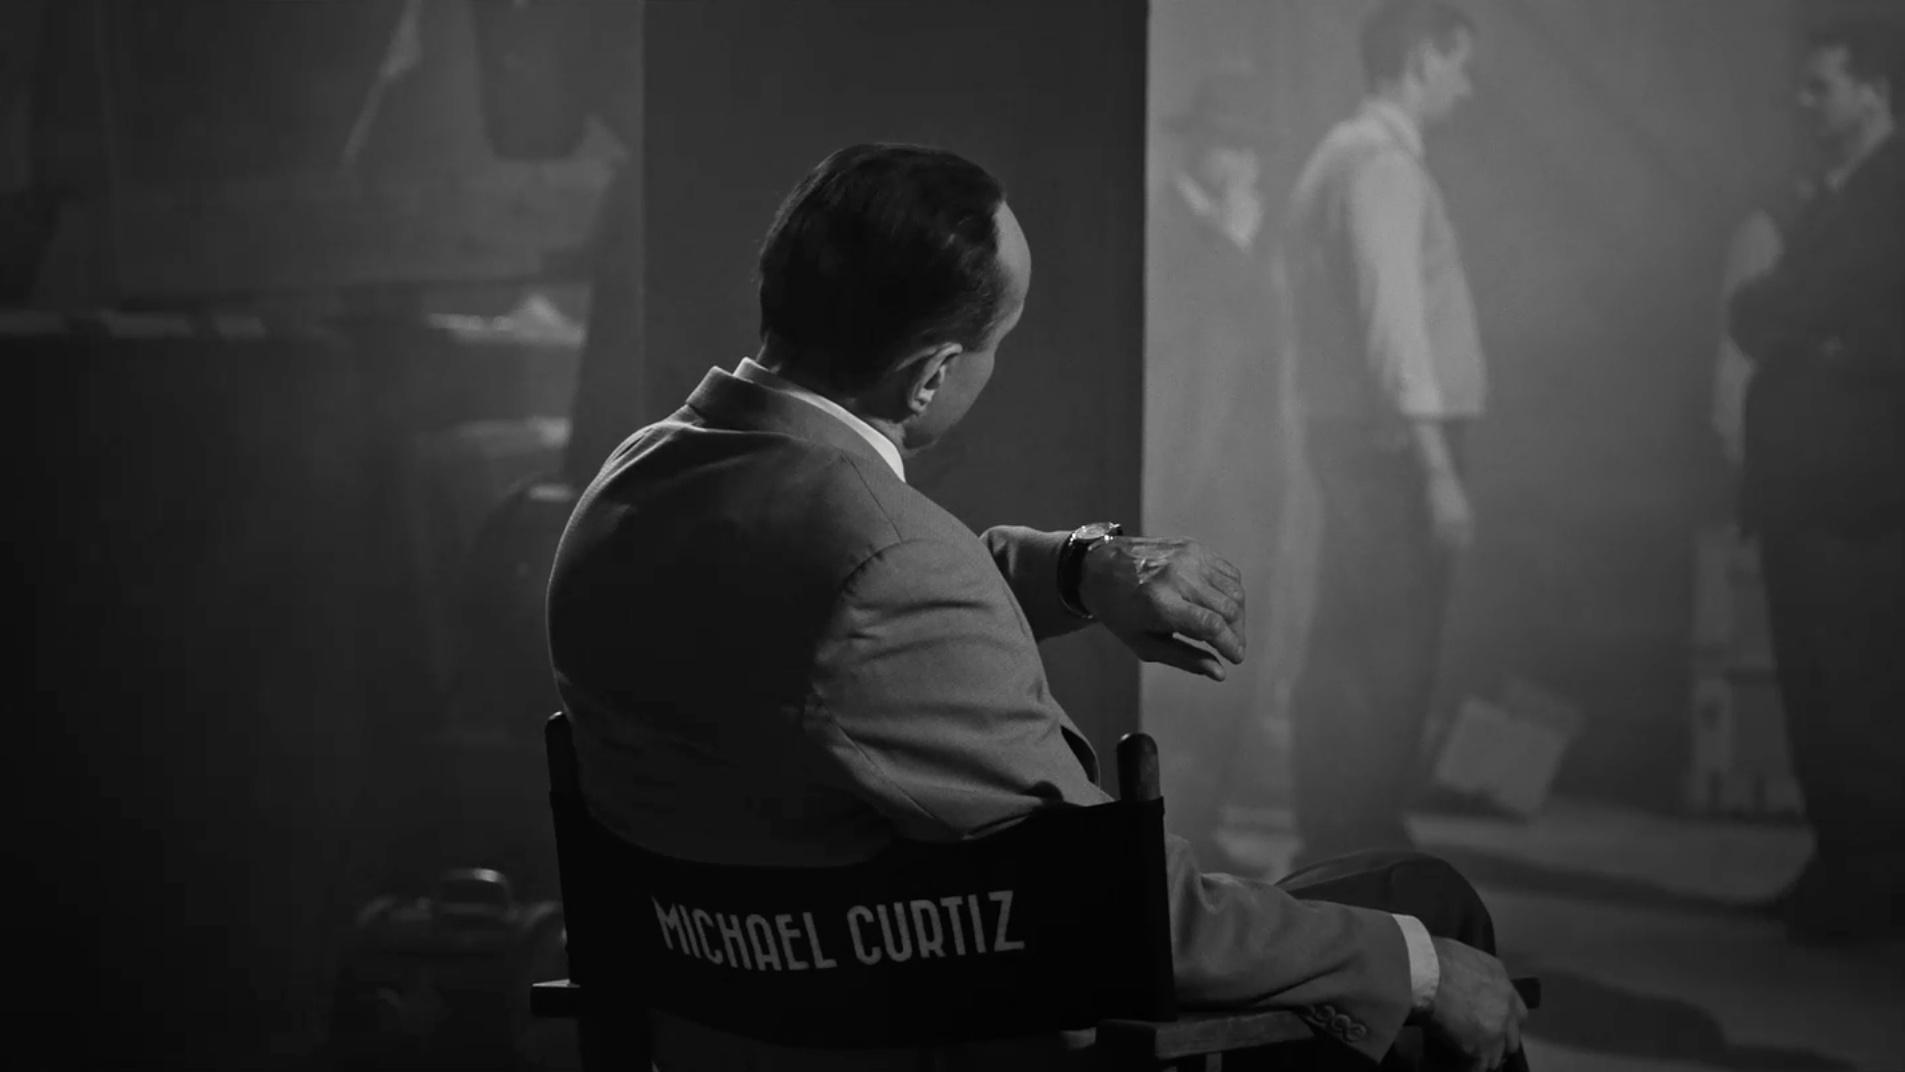 Mi a Casablanca titka?